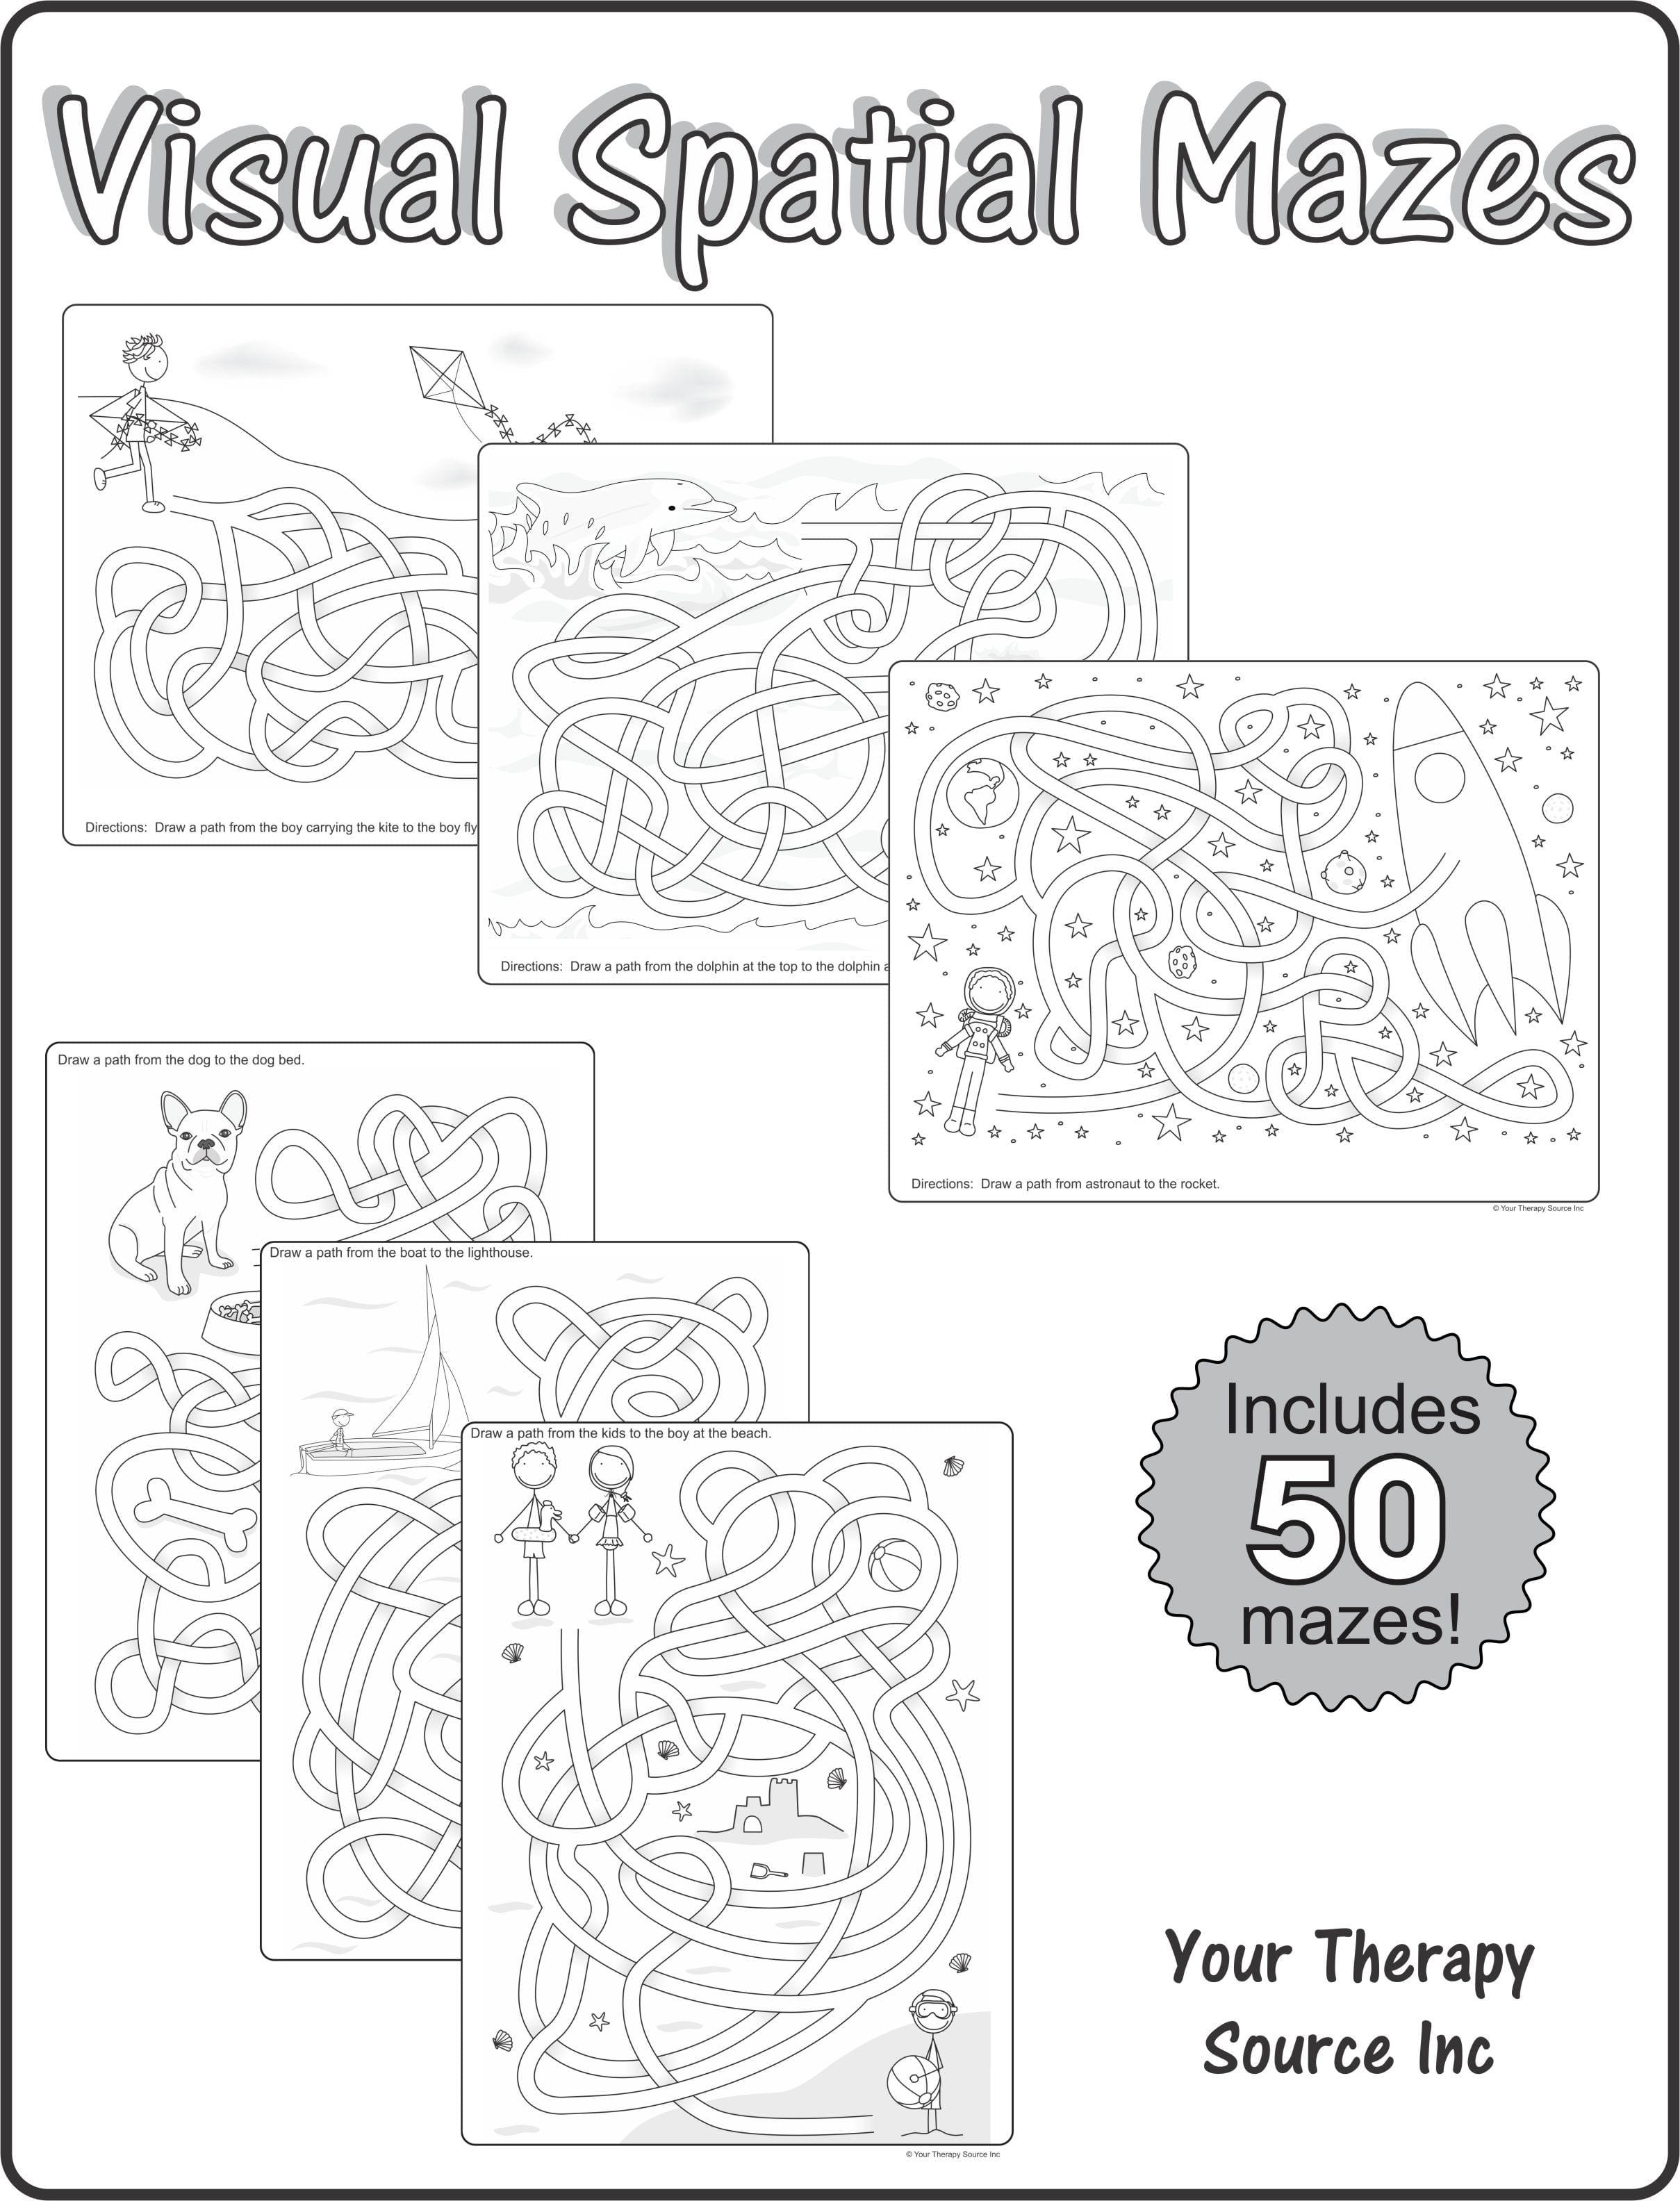 Visual Spatial Mazes